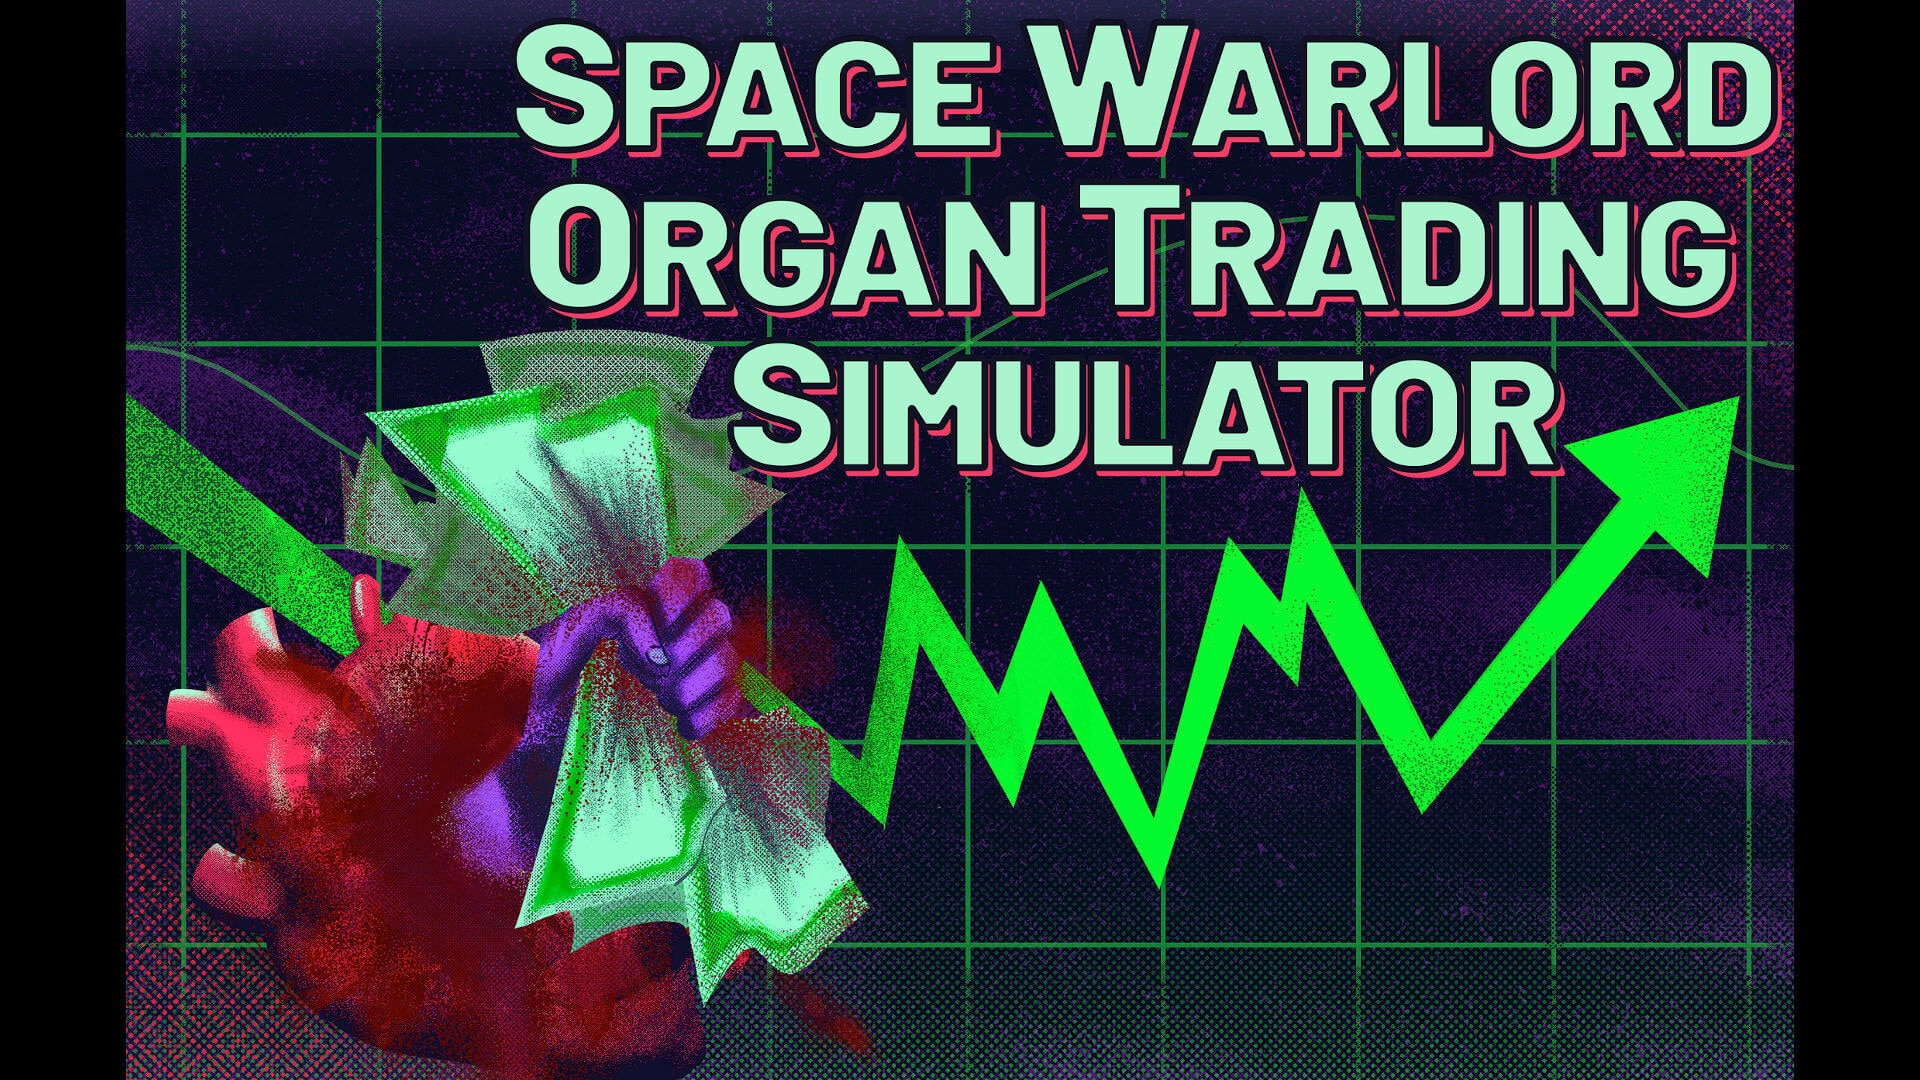 Space Warlord Organ Trading Simulator Key Art